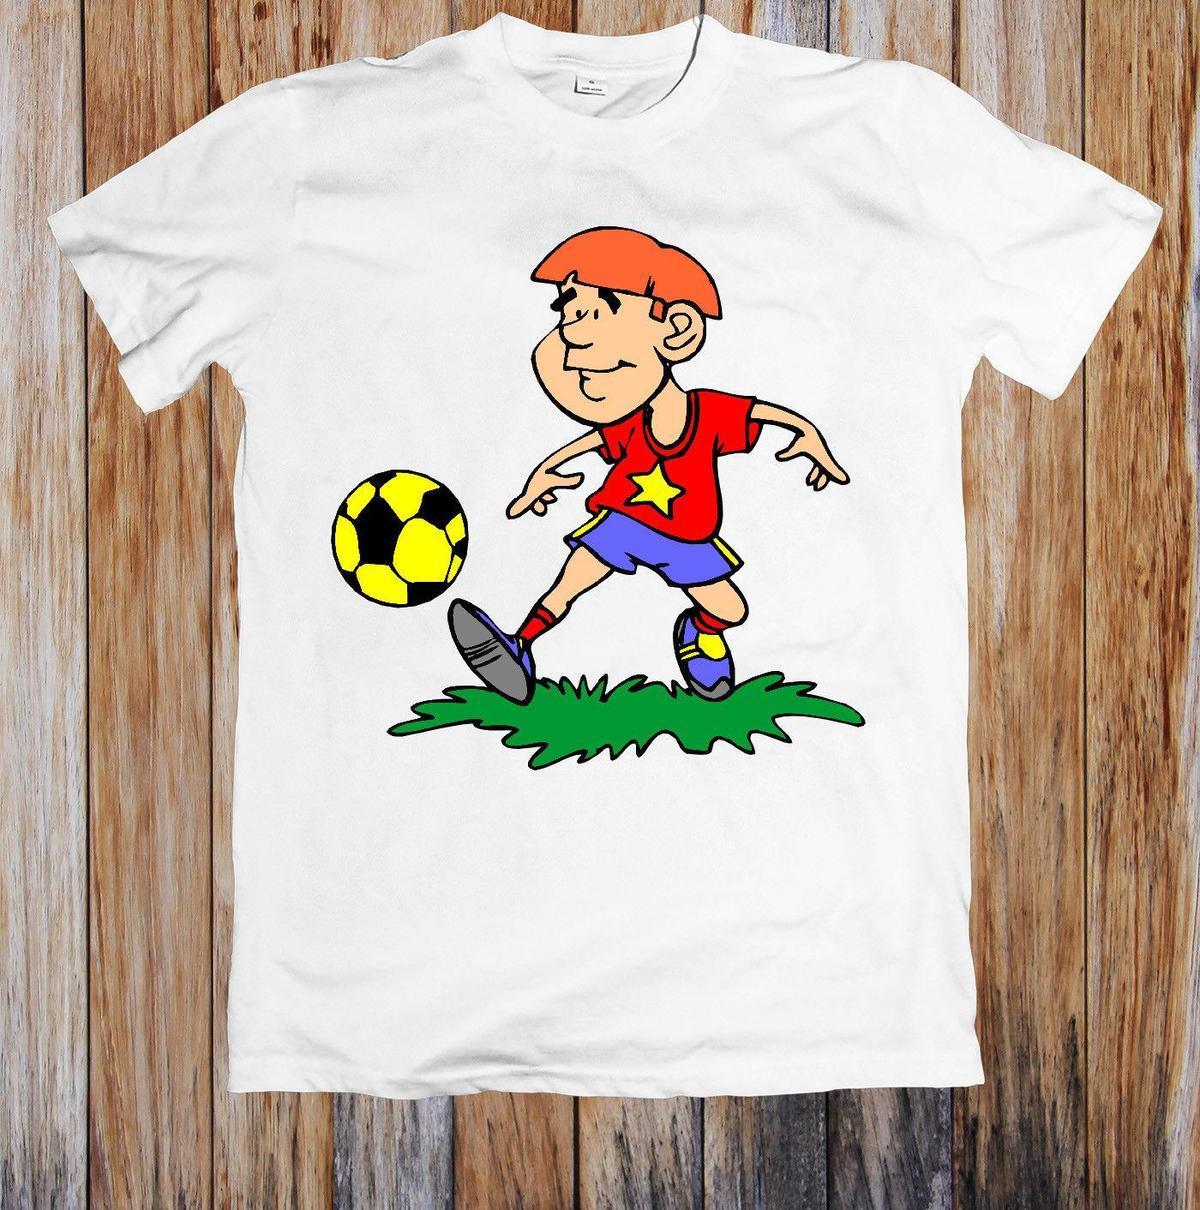 3ce3a3d99 SOCCER PLAYING BOY FUNNY UNISEX T SHIRT T Shirt Prints T Shirt Designing  From Yuxin001, $13.8| DHgate.Com